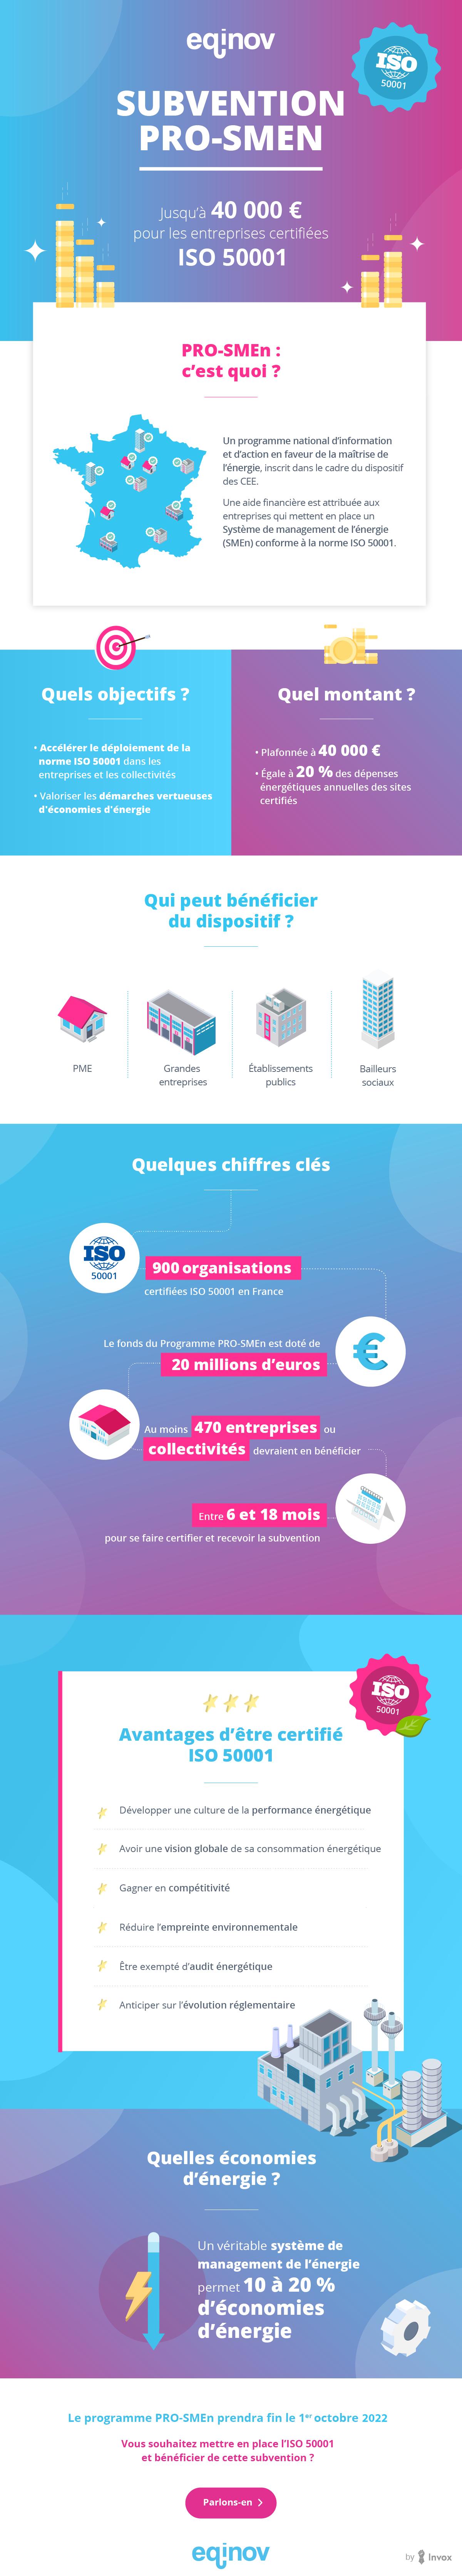 infographie subvention PRO-SMEn